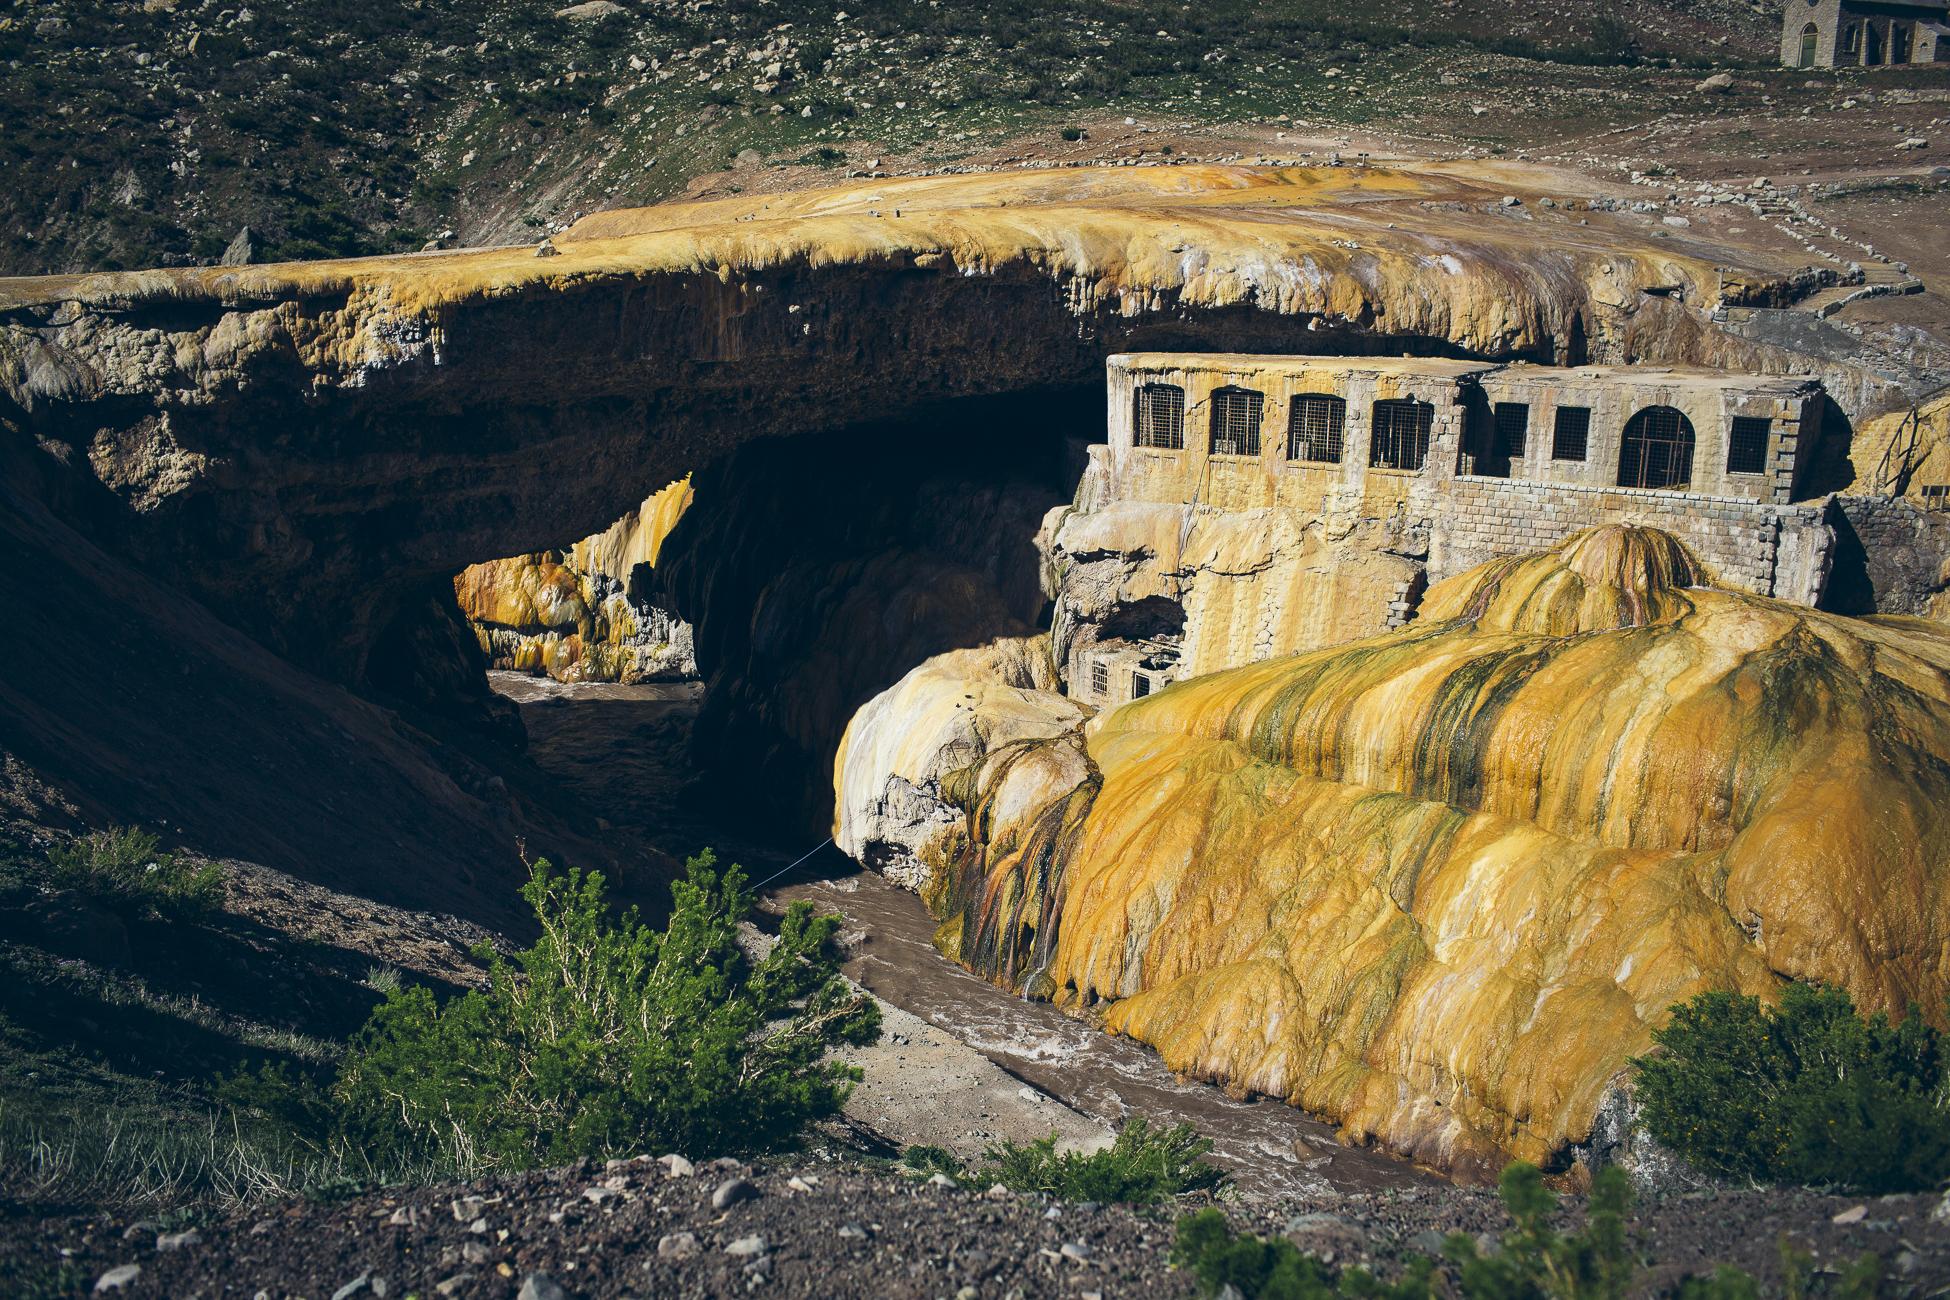 desktoglory_northern_argentina-116